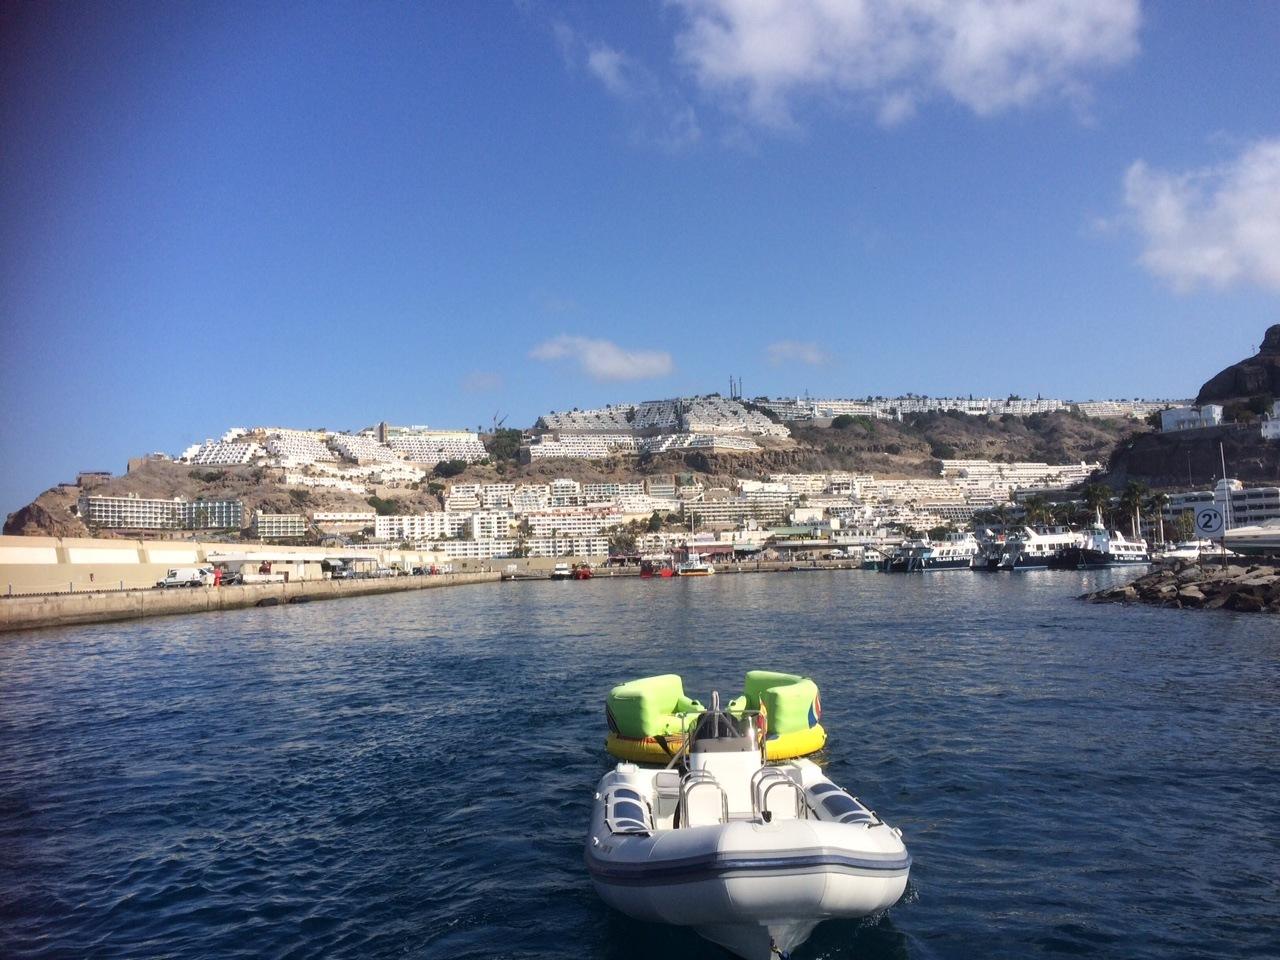 Leaving Puerto Rico on the Afrikat Catamaran